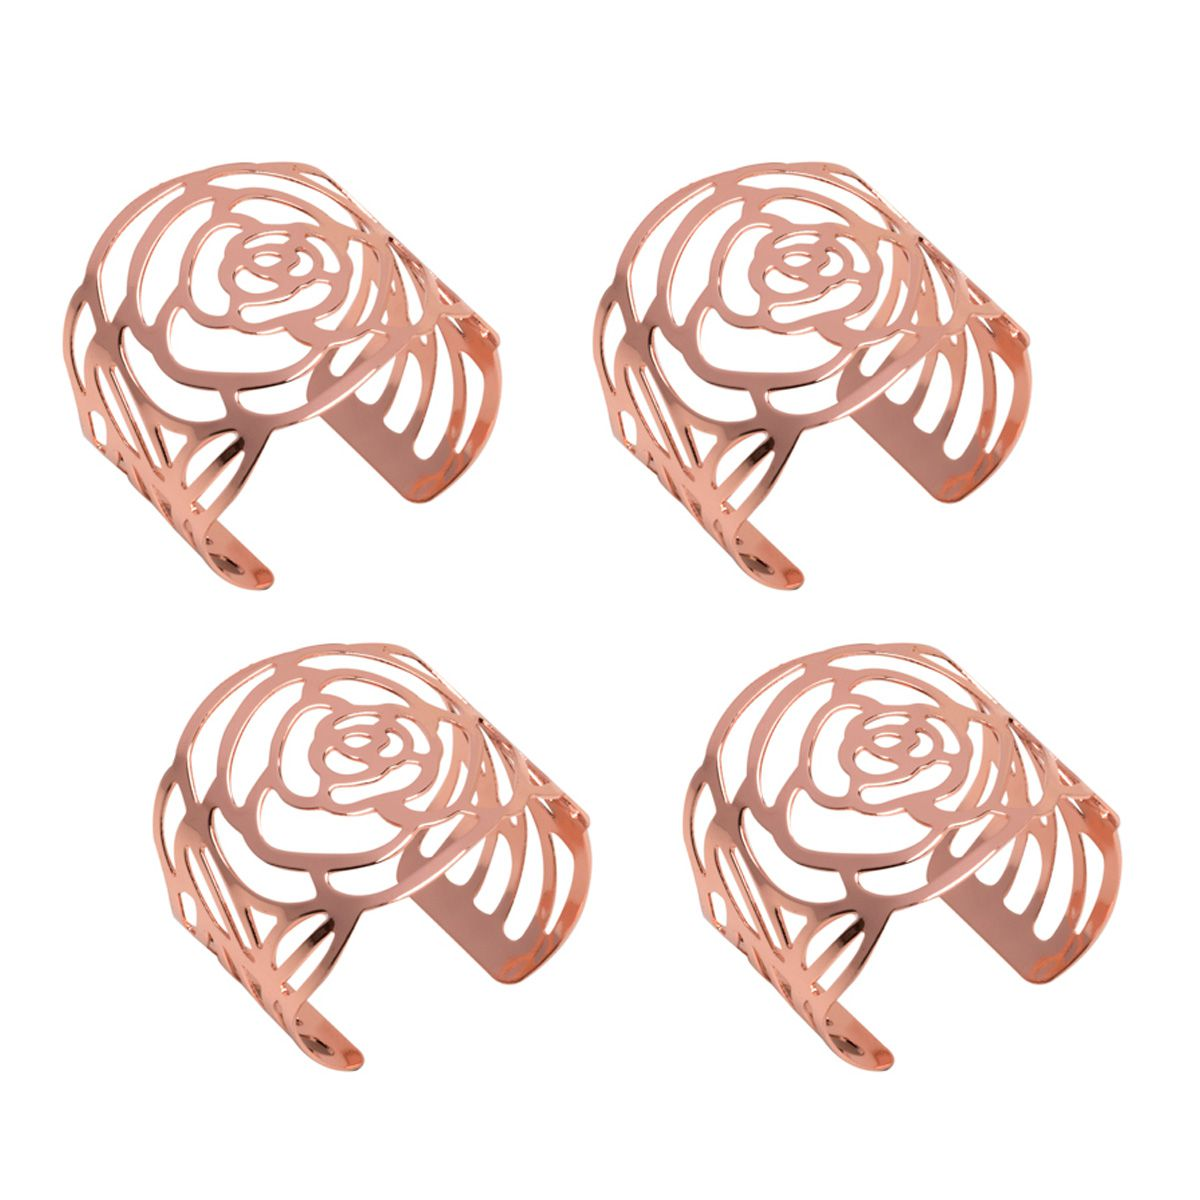 Jogo 4 anéis para guardanapo de aço inox rosé gold Cut Prestige - 26510